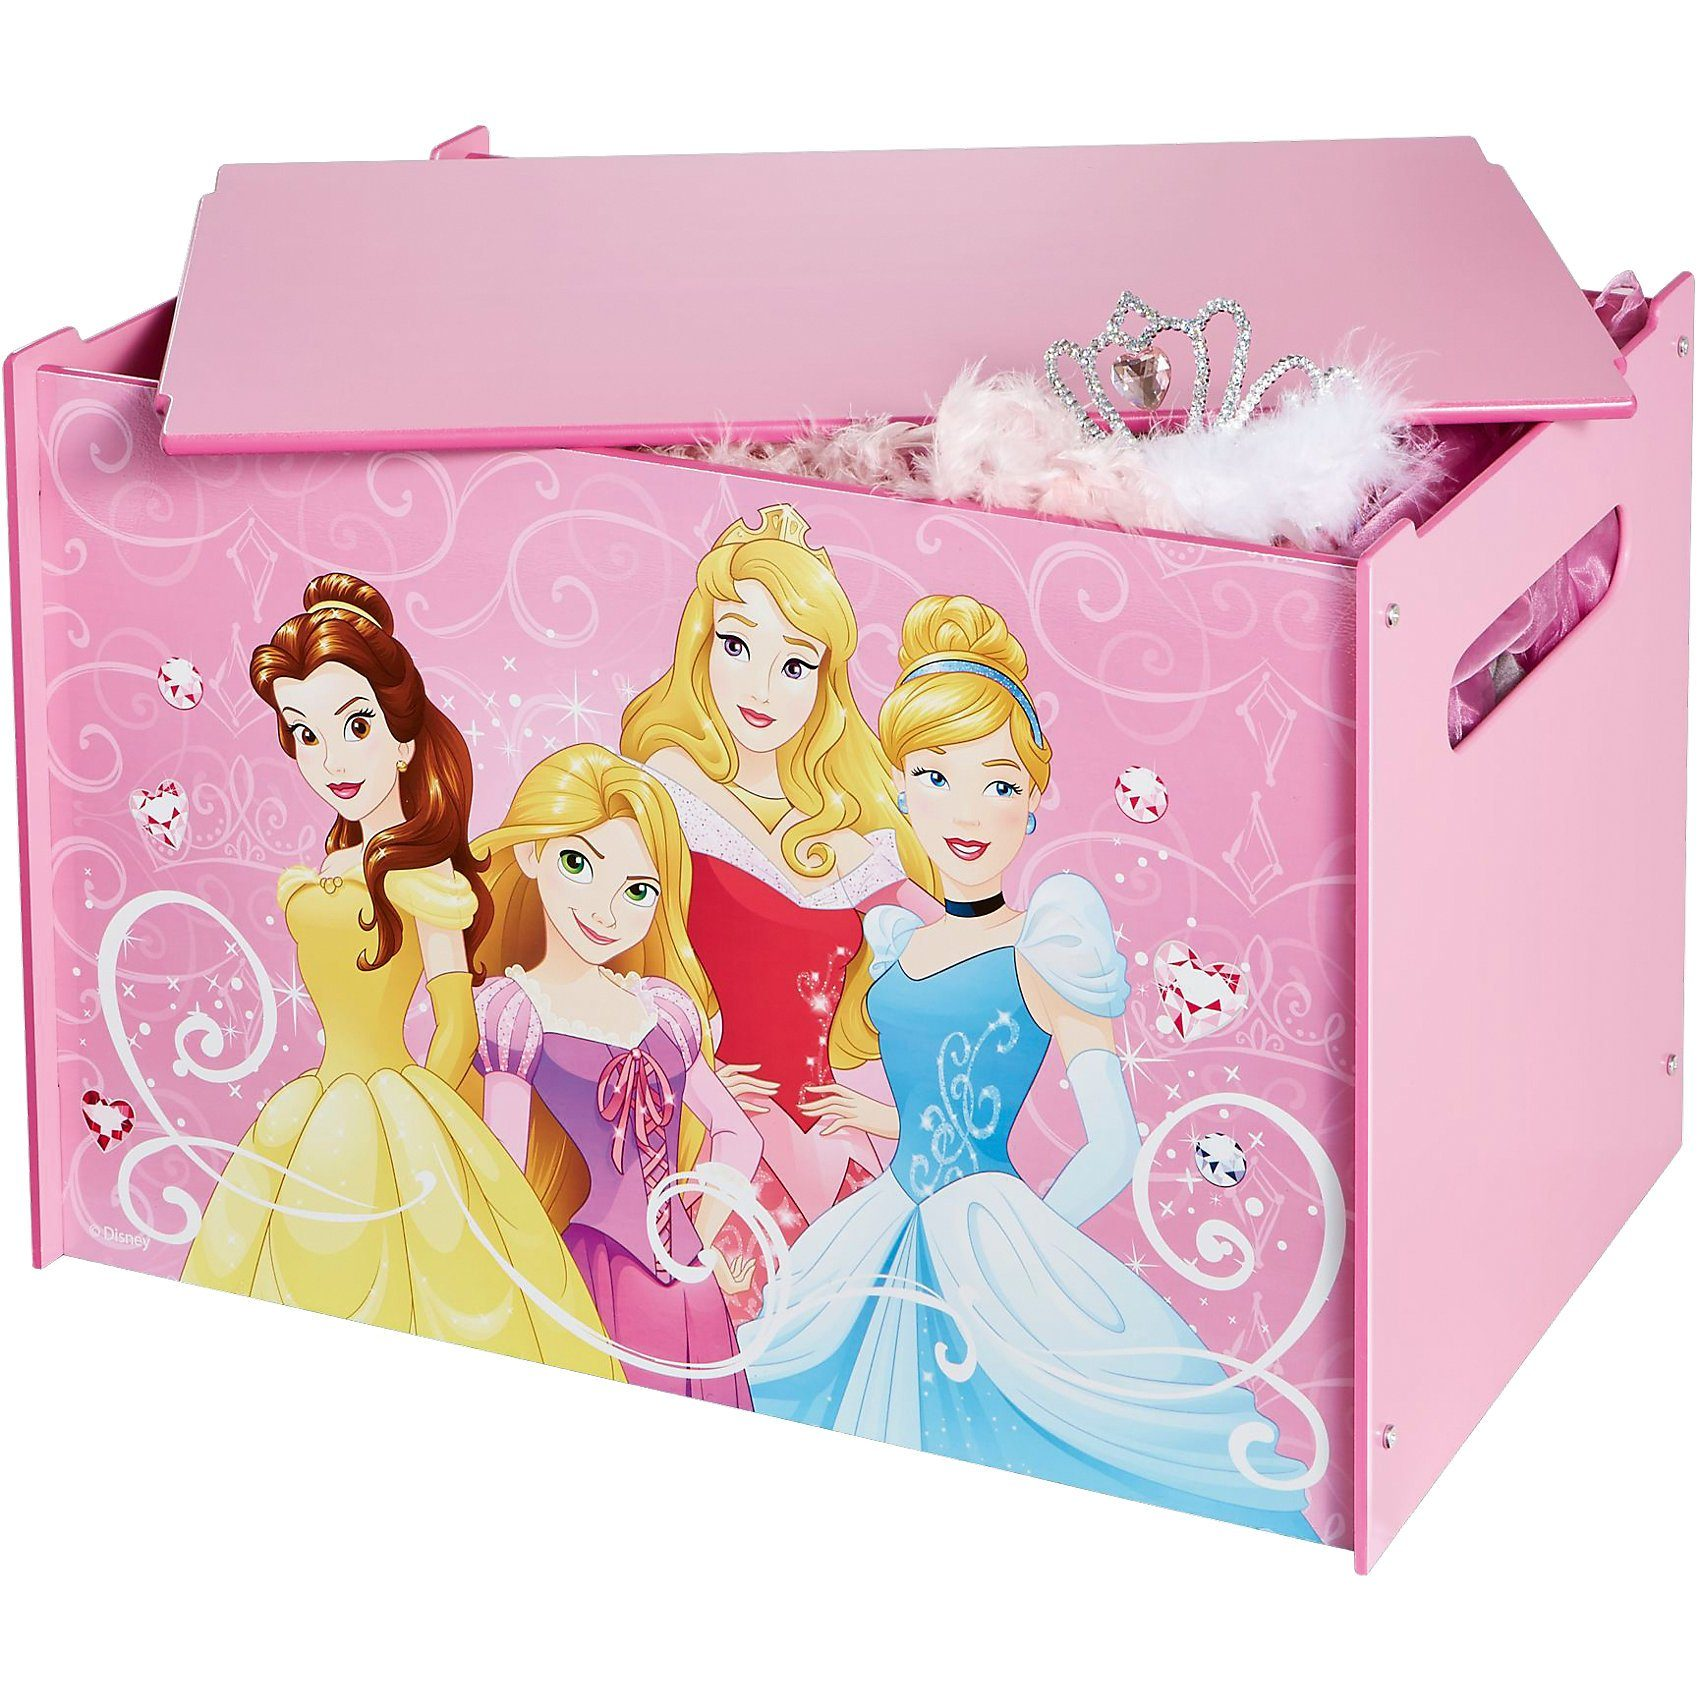 WORLDS APART Spielzeug Truhe, Disney Princess